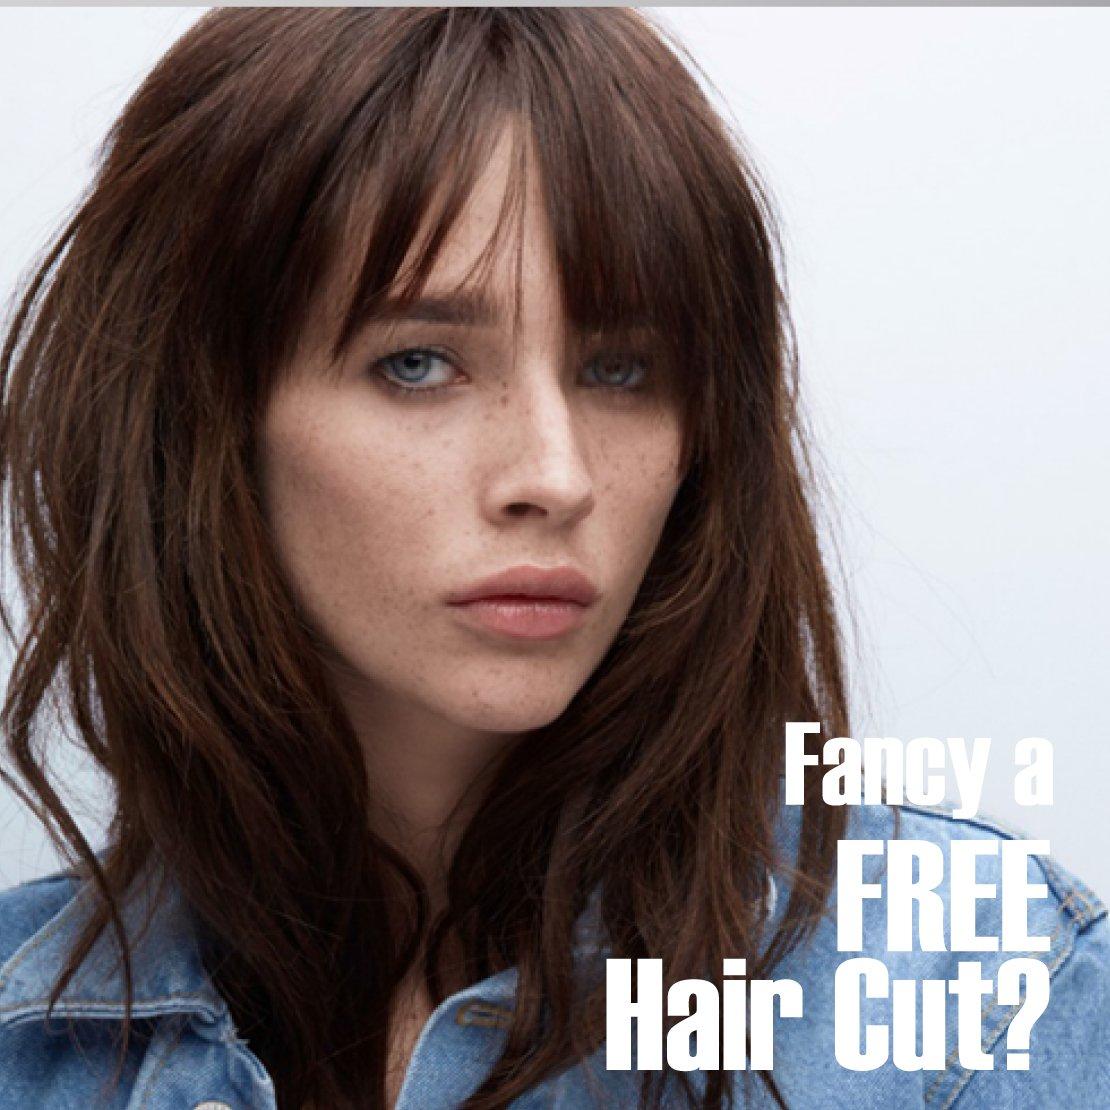 Hair Cut Colour Discounts Beauty Offers Birmingham Salon